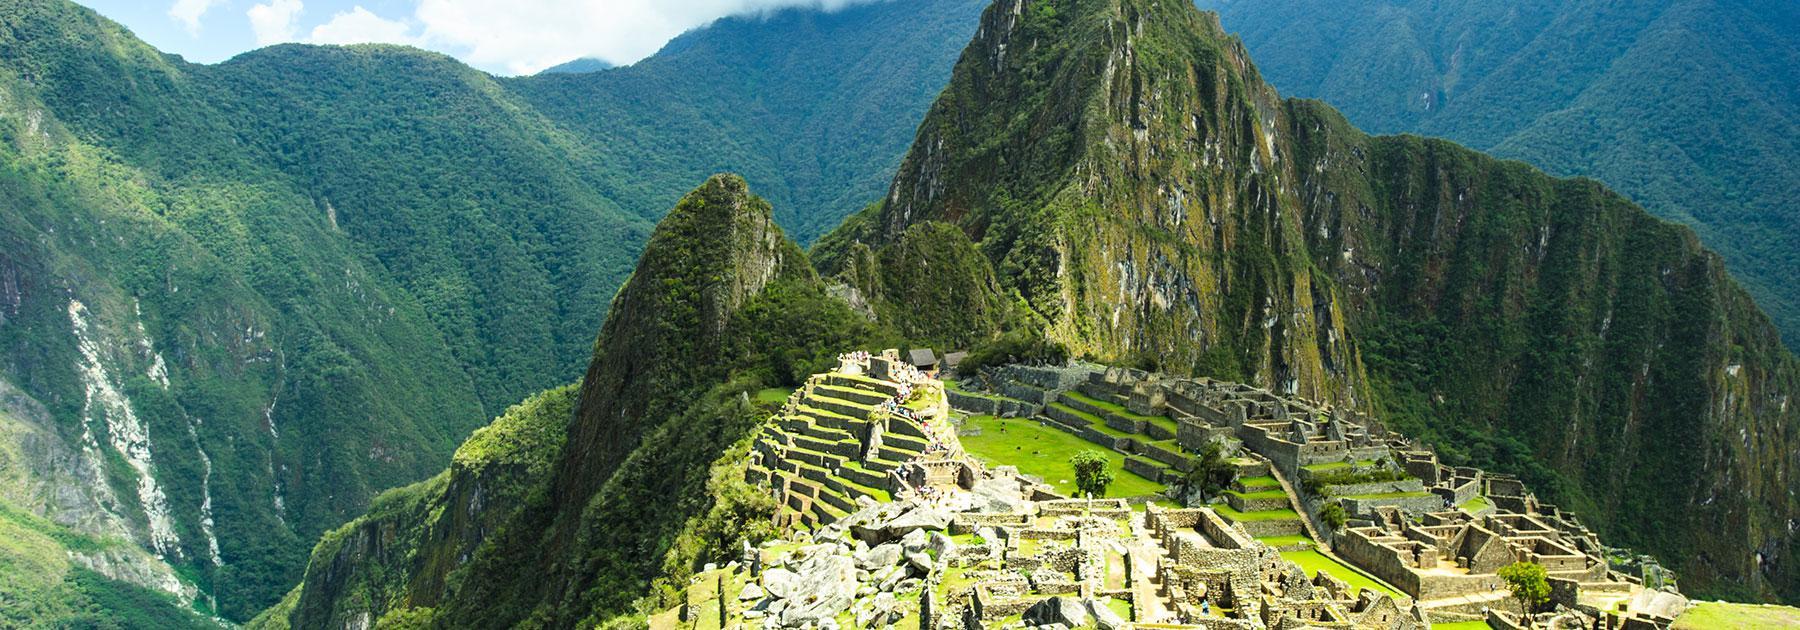 Peru Vacations With Airfare Trip To Peru From Gotoday - Peru vacation